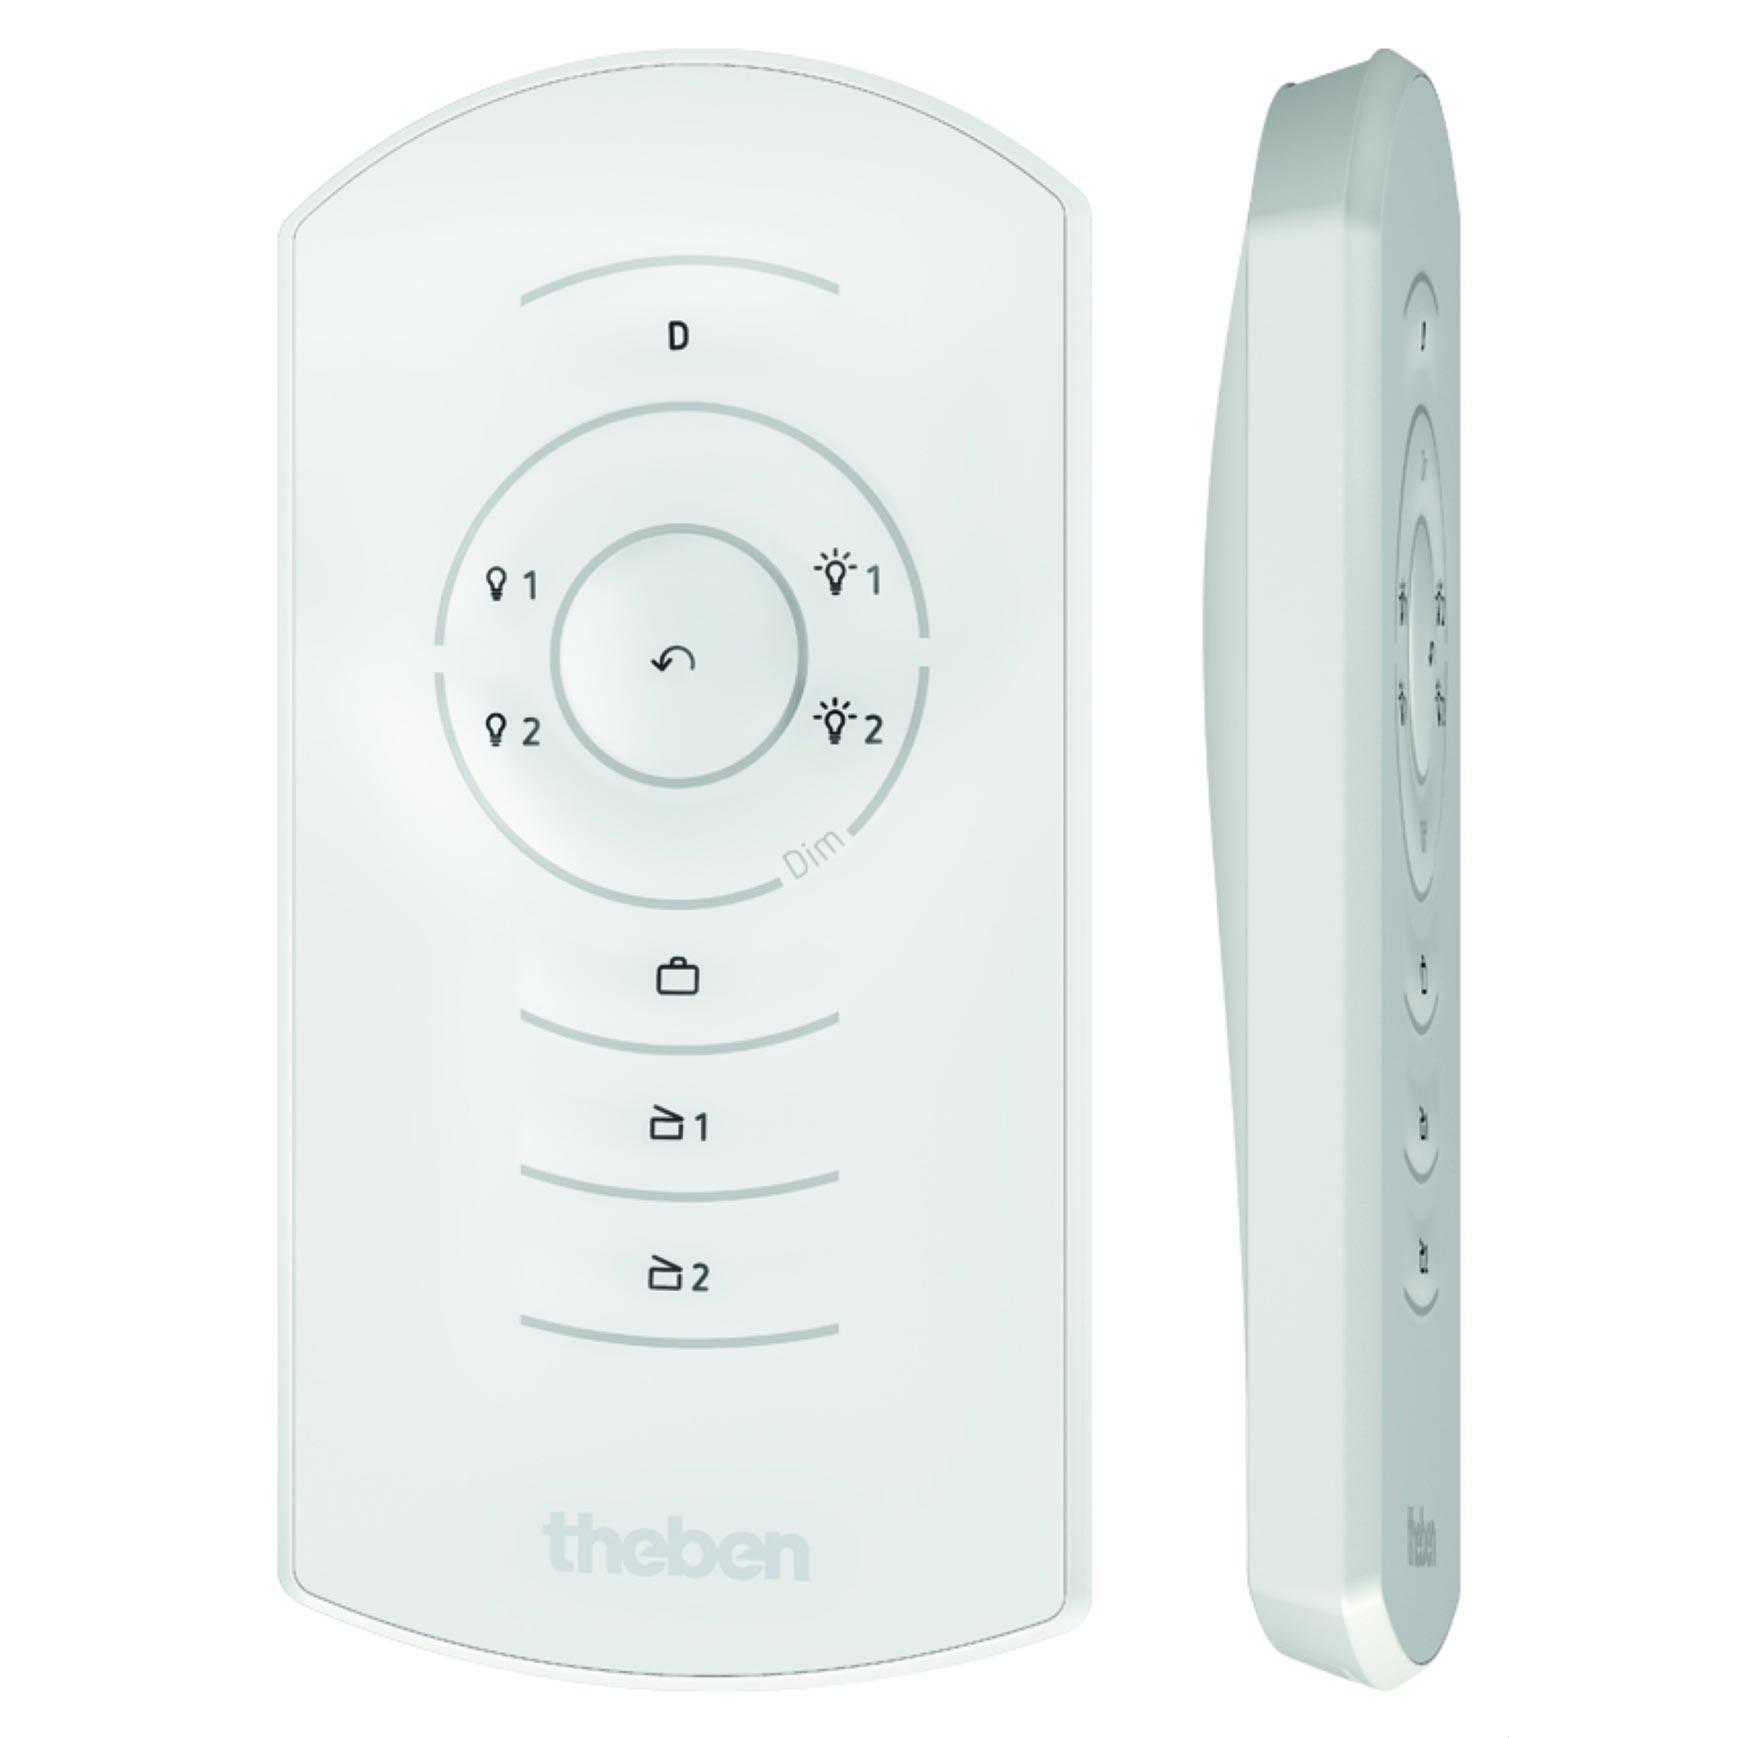 Theben - THB9070911 - TELECOMMANDE UTILISATEUR THESENDA